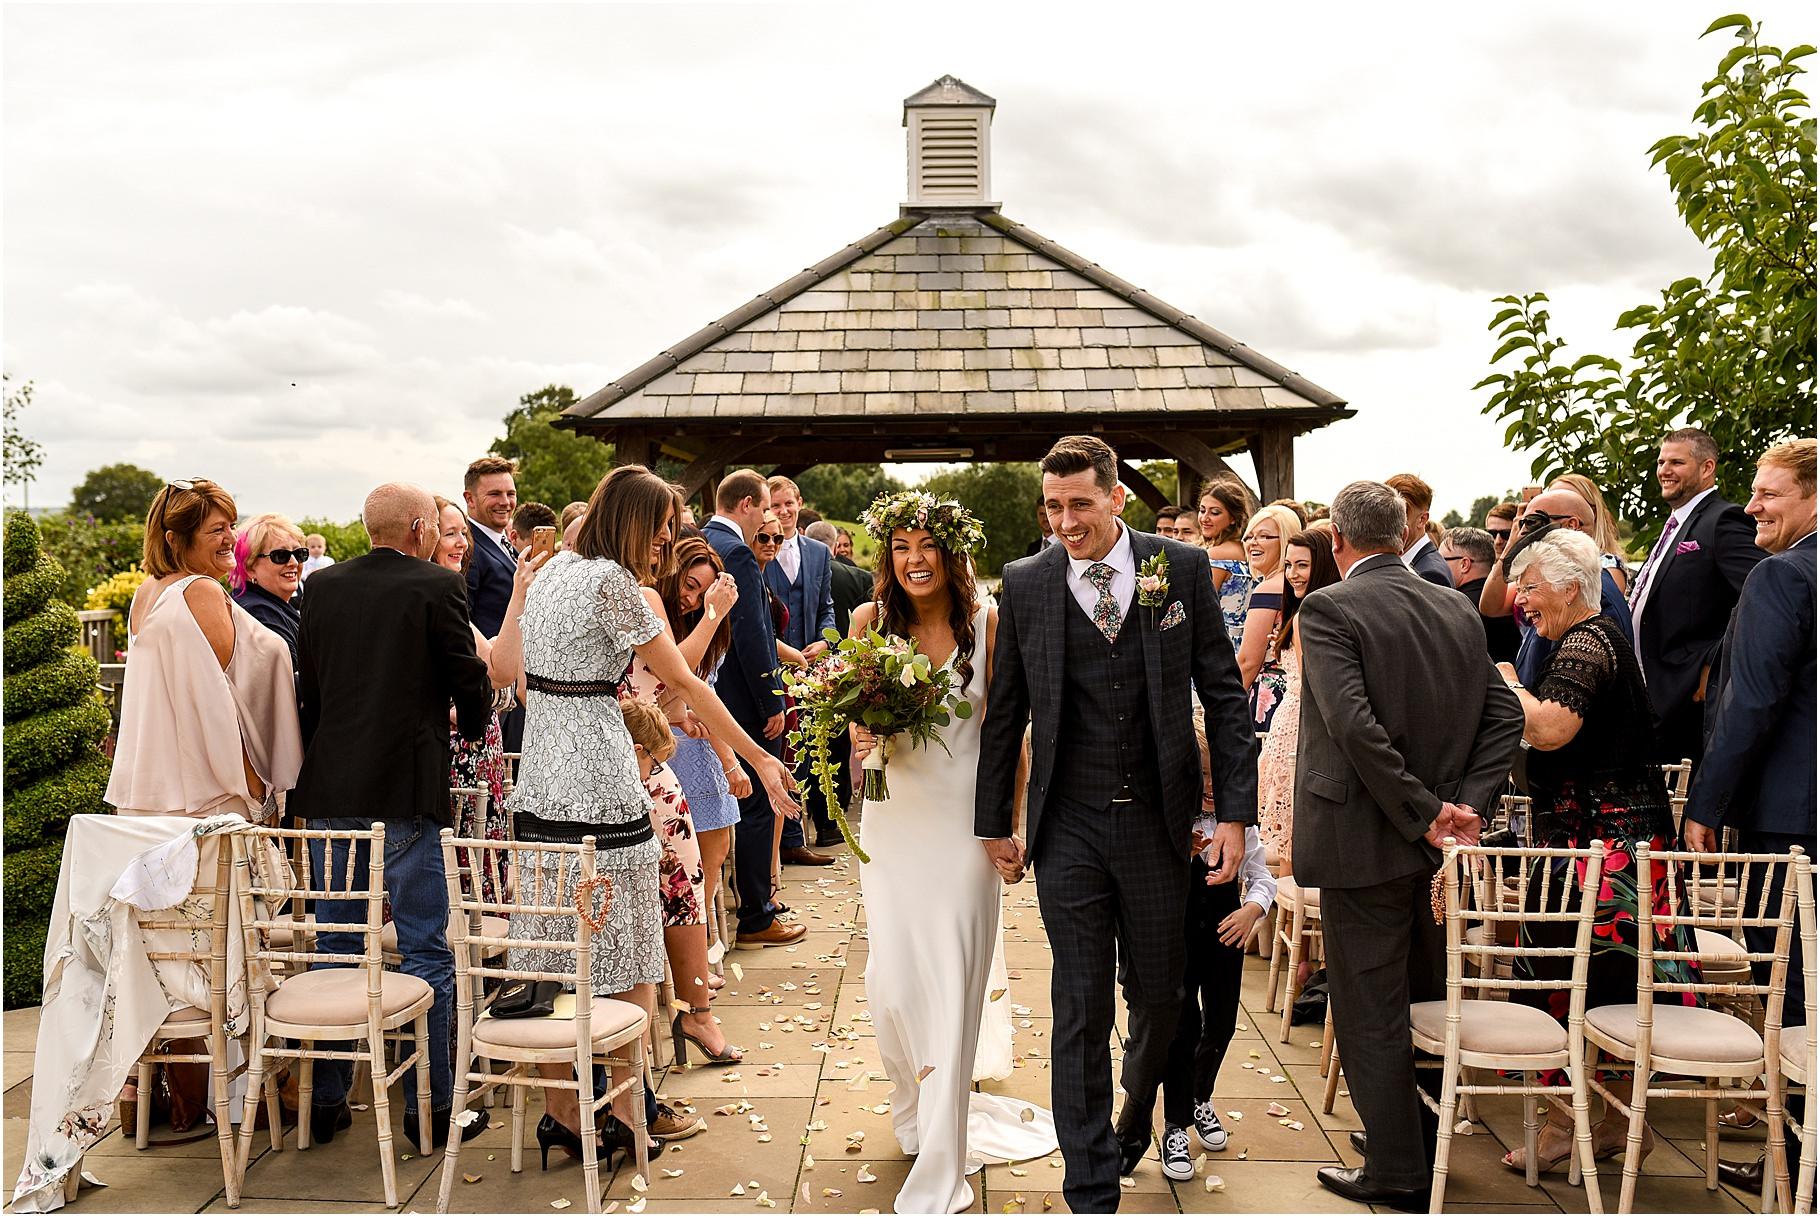 dan-wootton-photography-2017-weddings-012.jpg